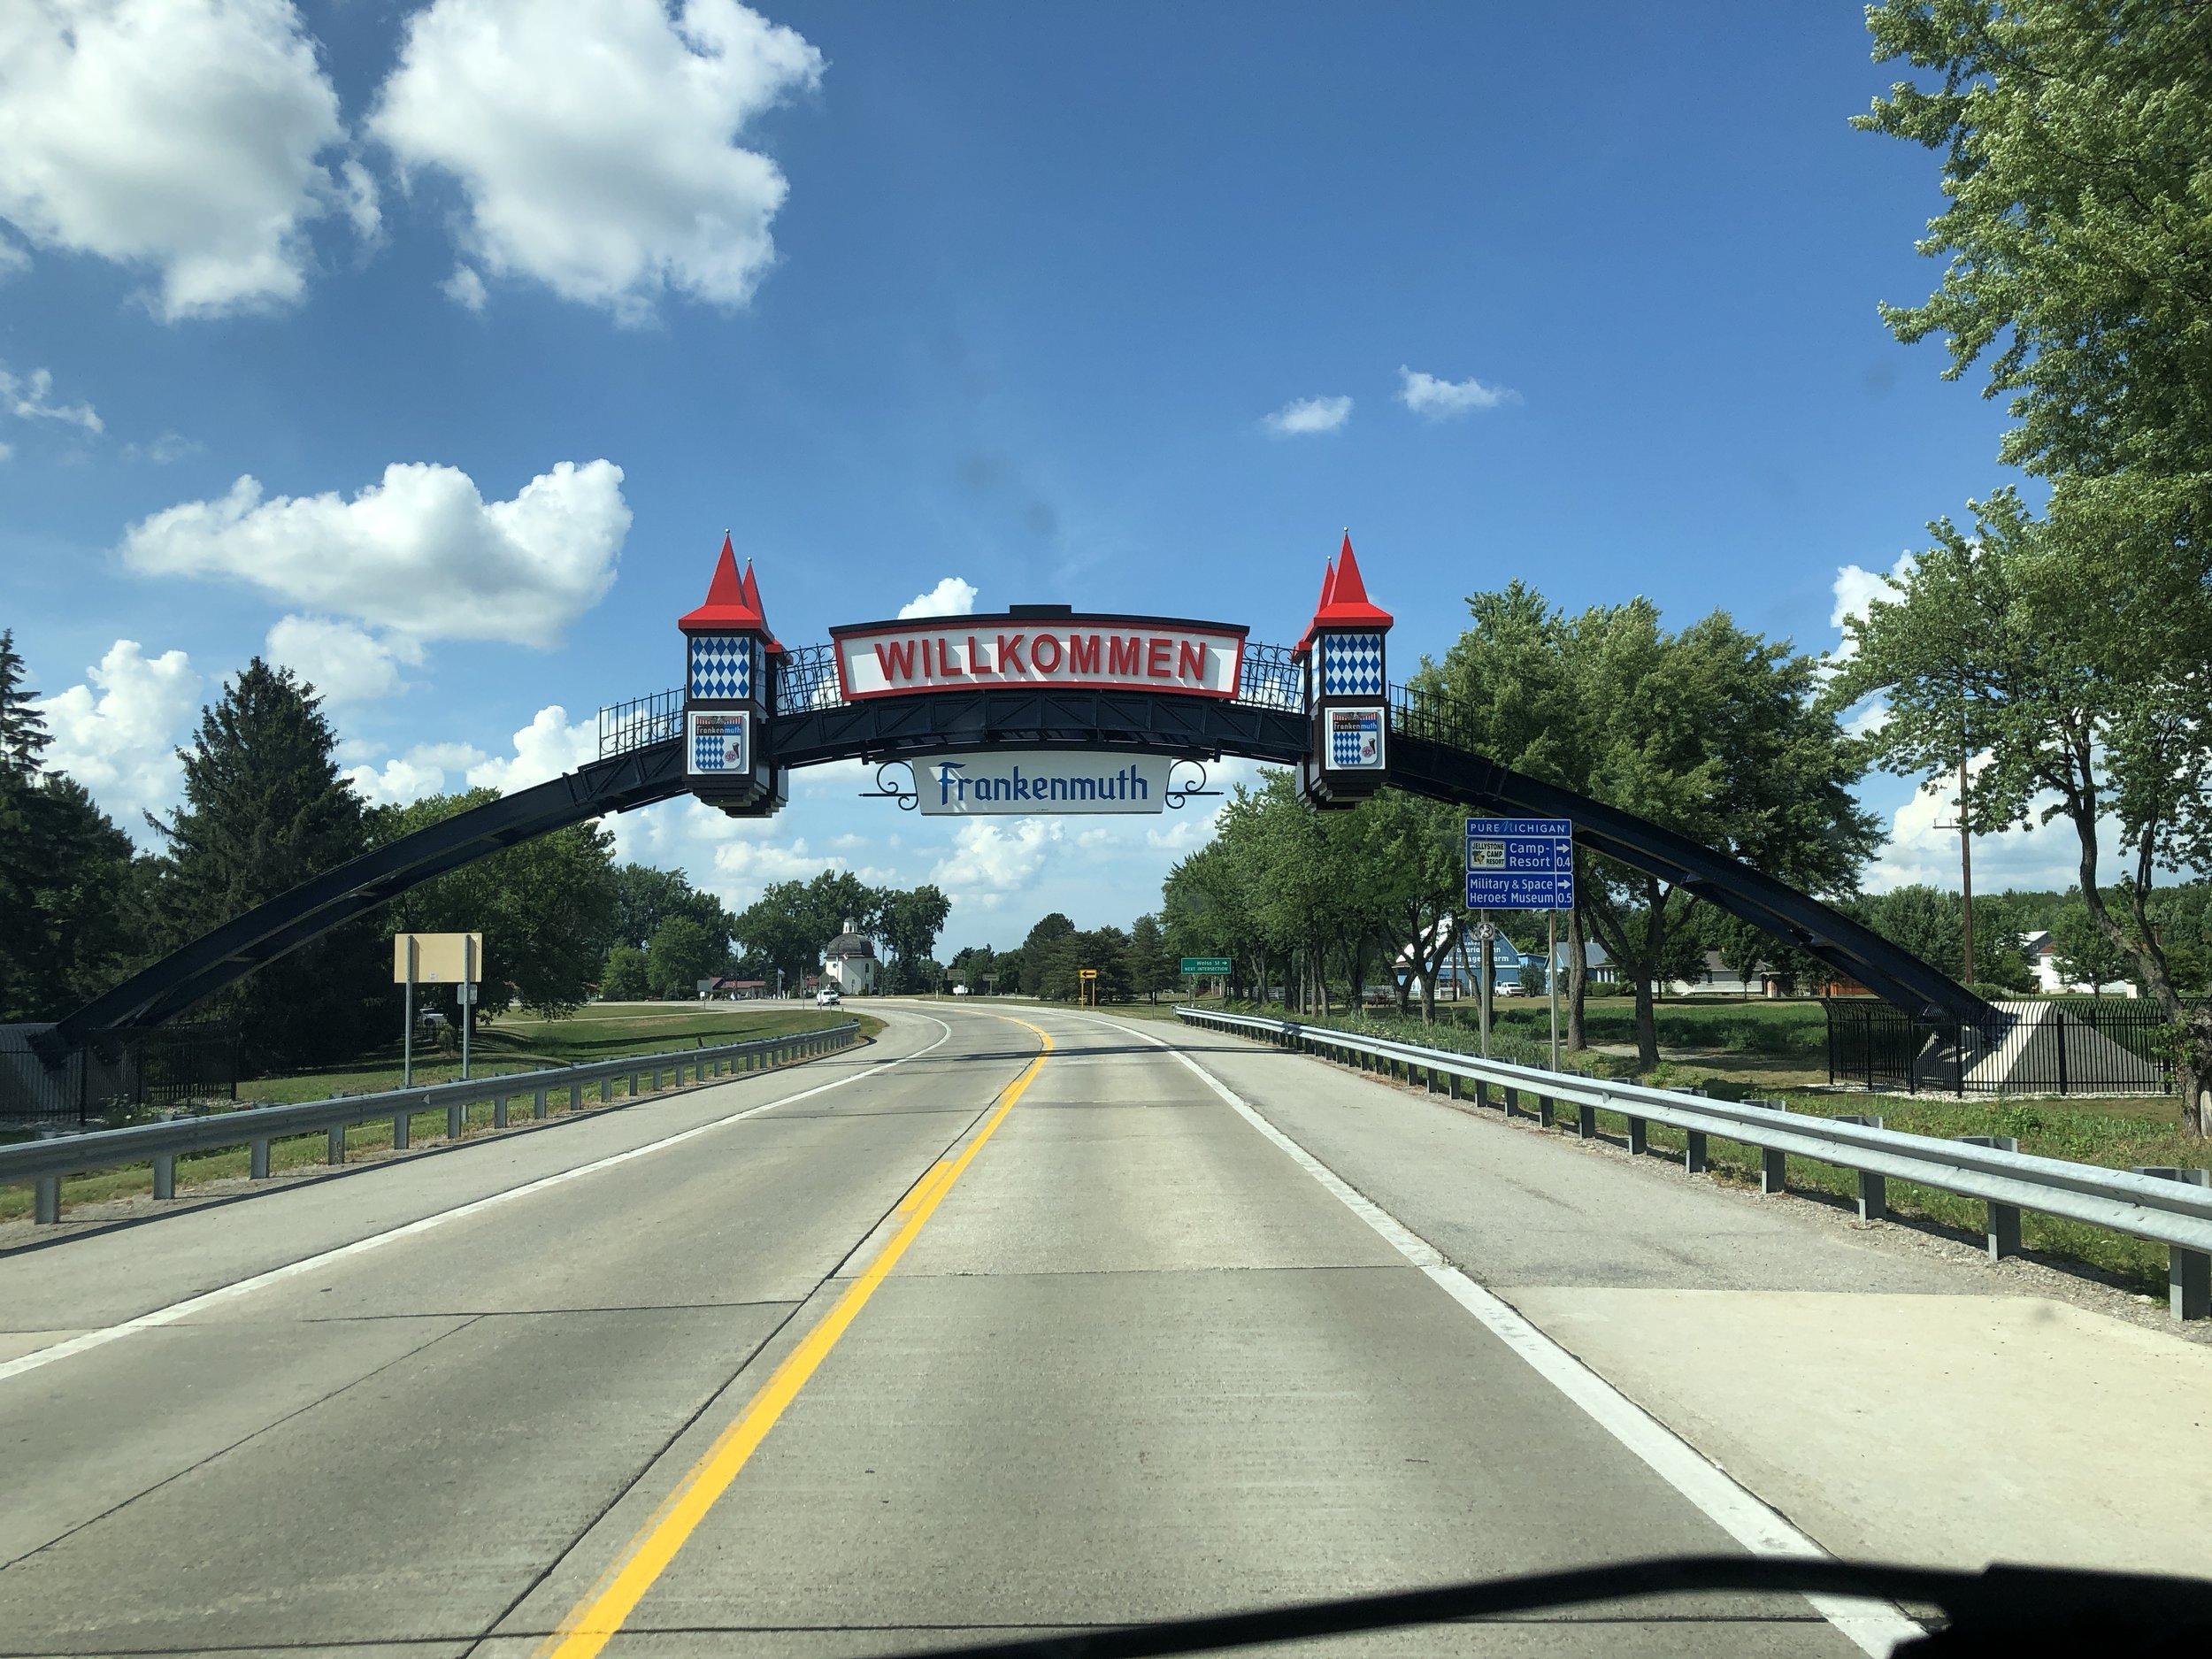 What a cute little town! Frankenmuth, Michigan.